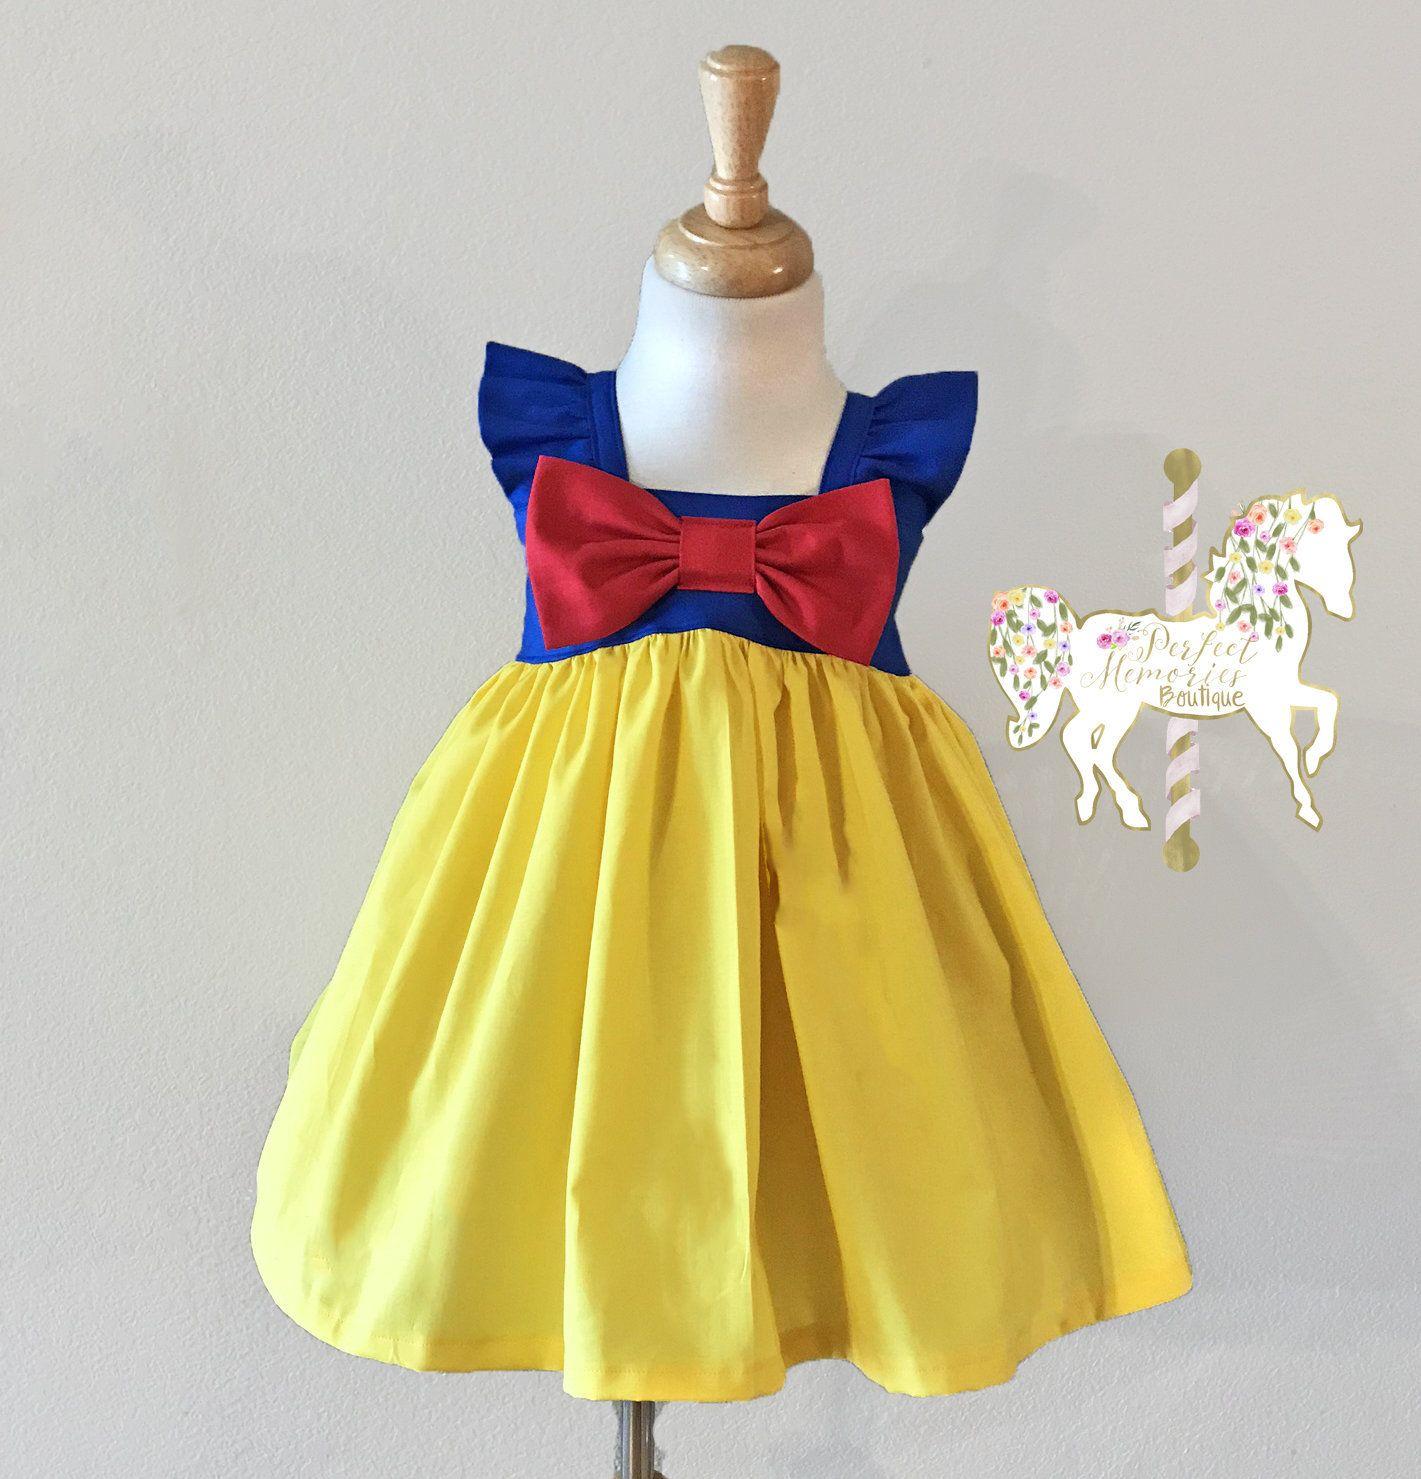 Micky Halloween dress Disney Park Visit Baby dress Ready to ship Toddler dress Flutter sleeve dress